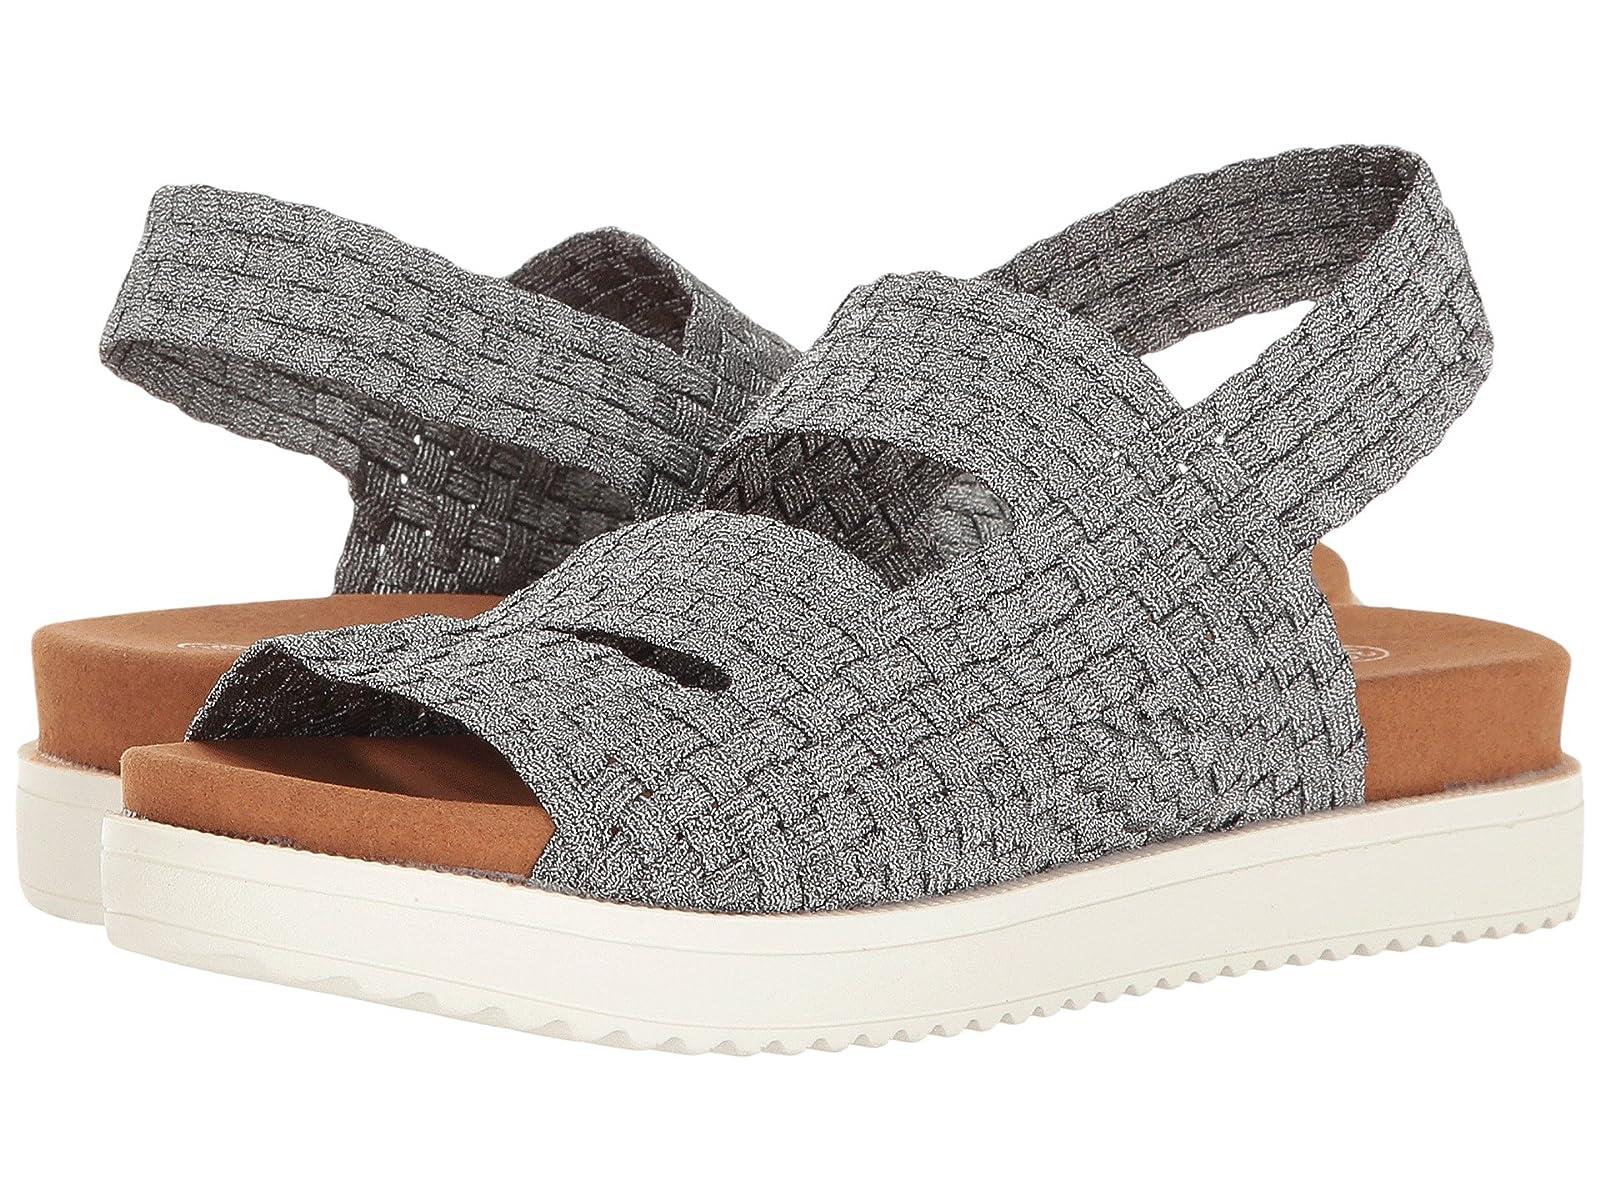 bernie mev. CrispCheap and distinctive eye-catching shoes